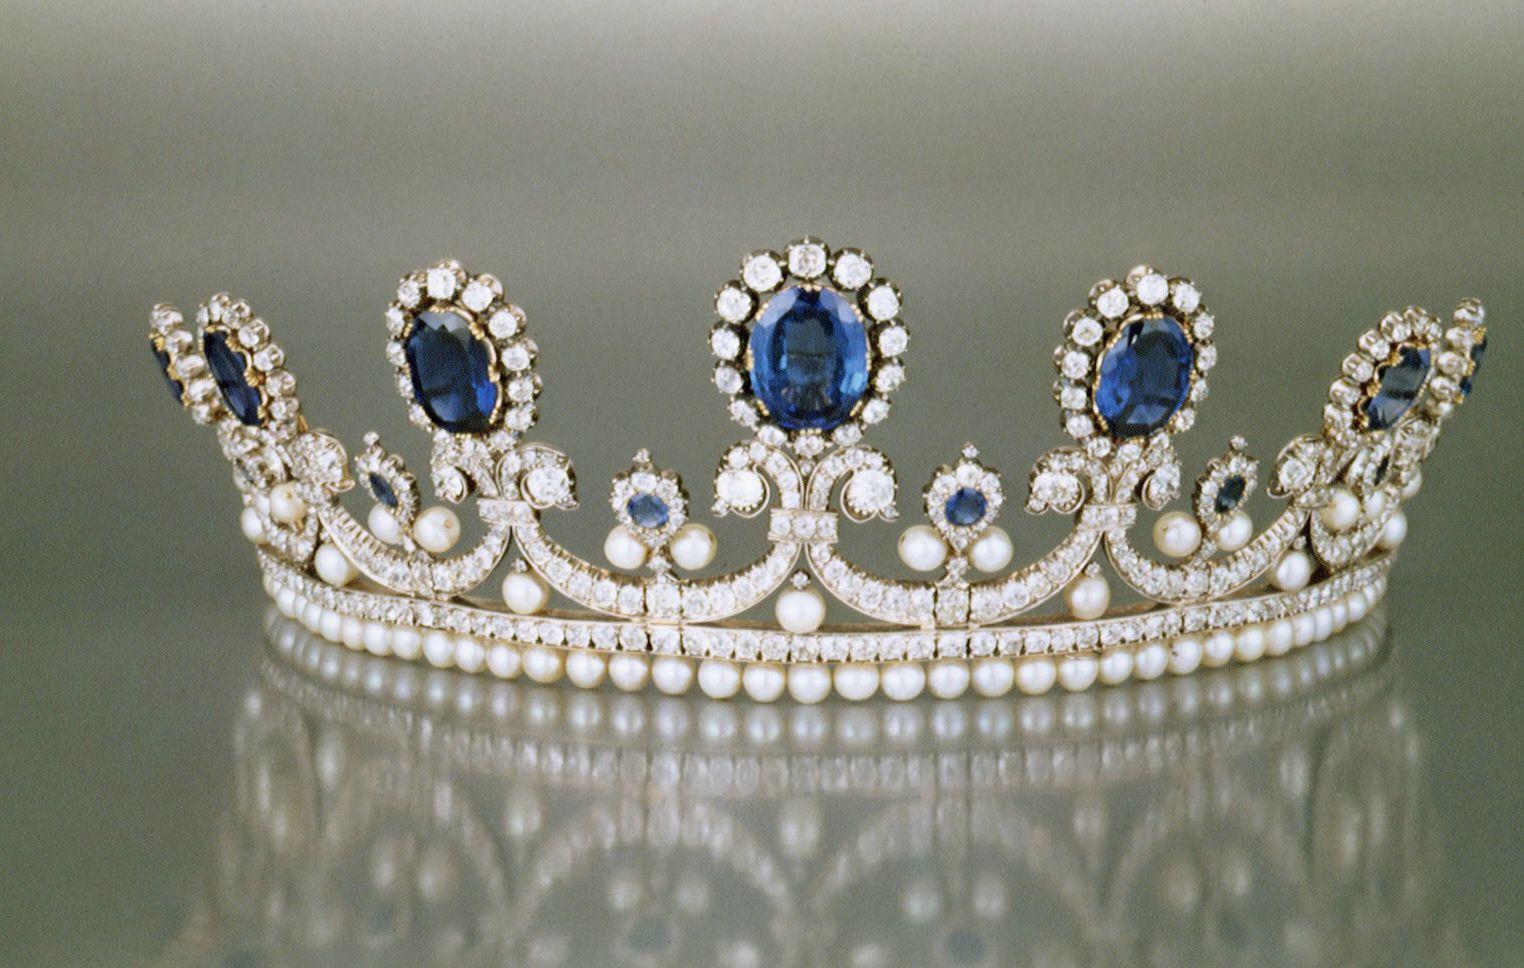 The best September birthstone jewellery